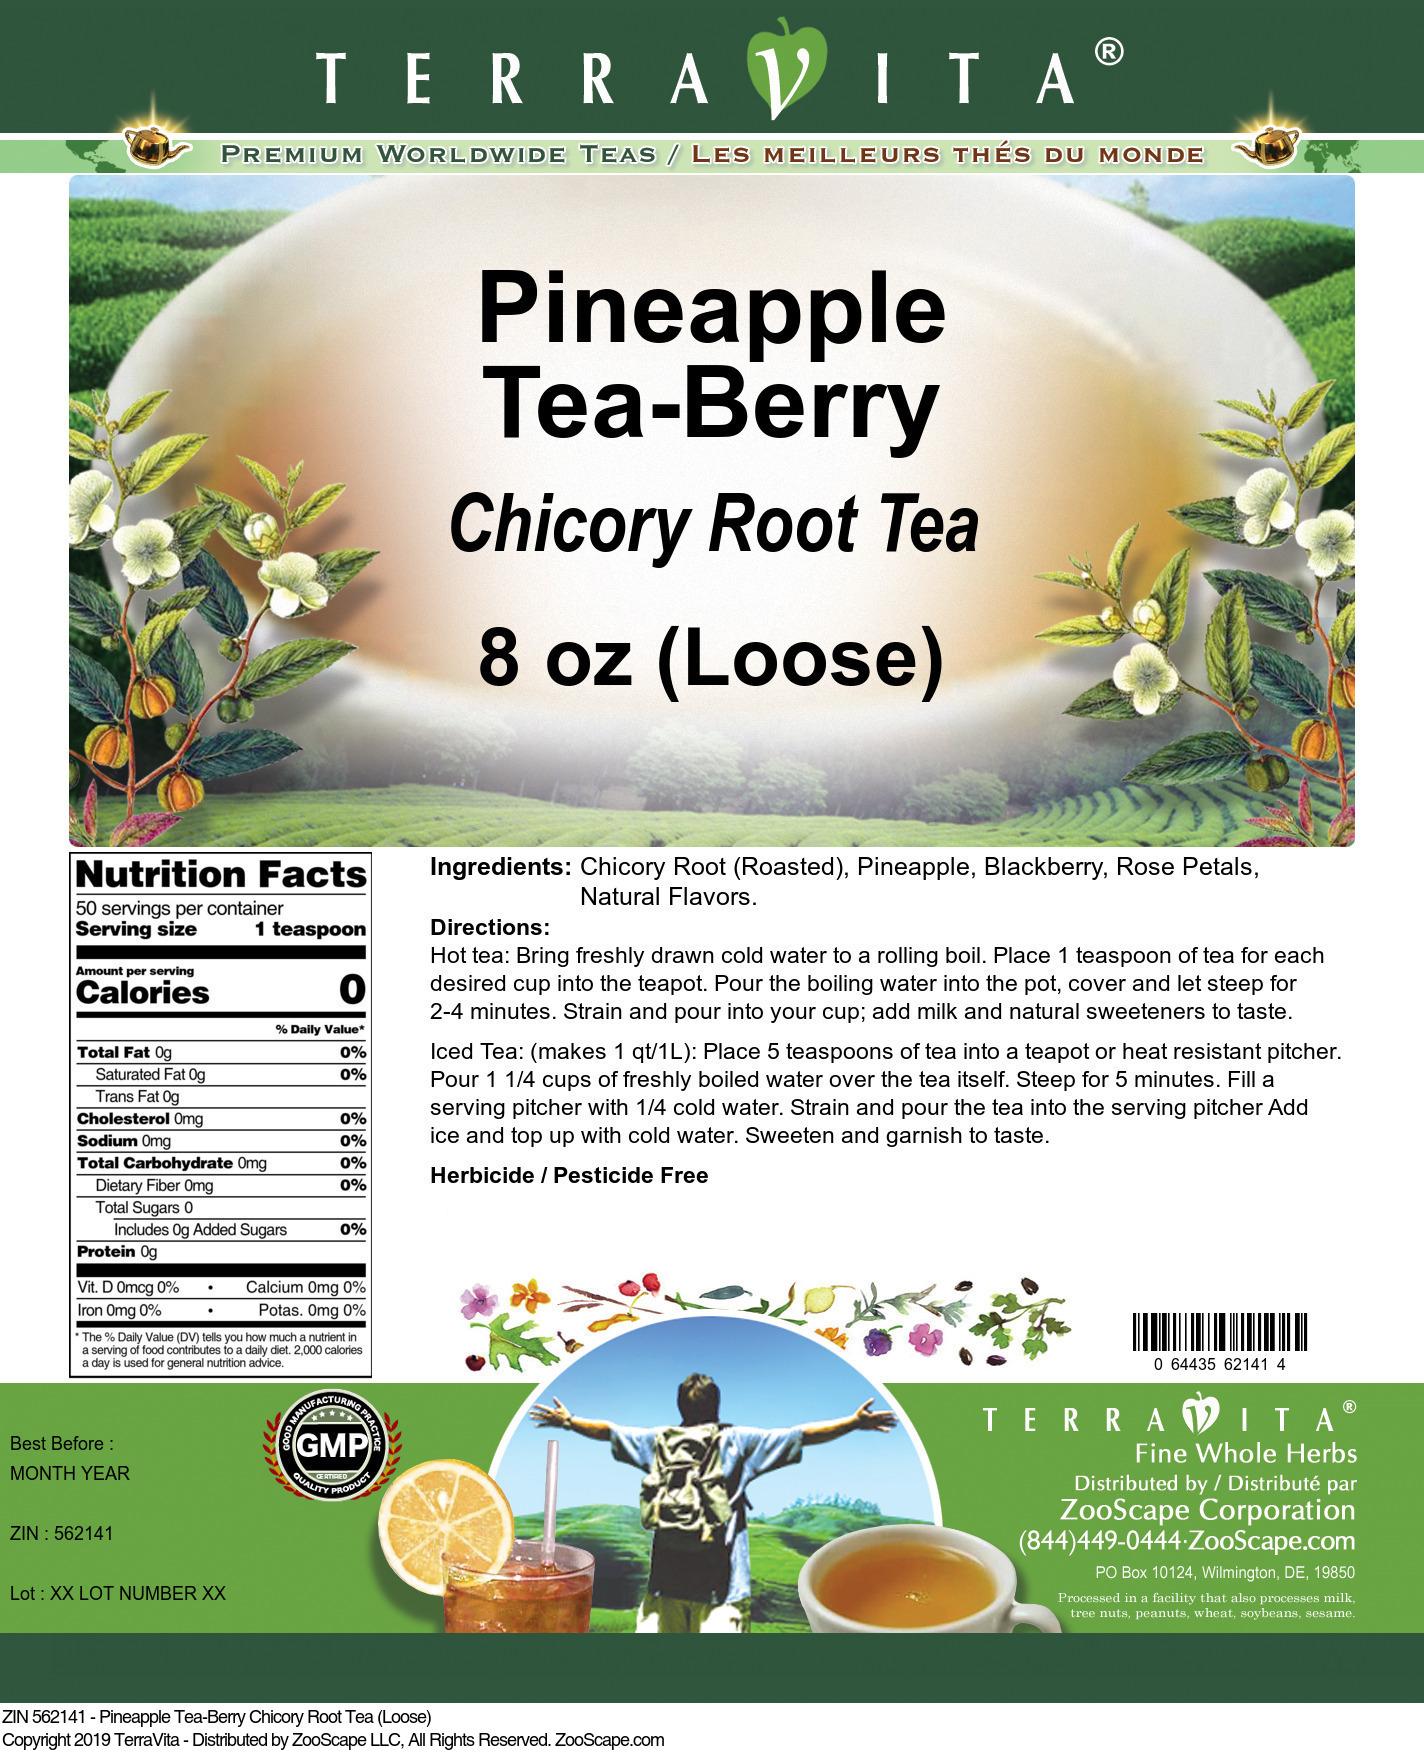 Pineapple Tea-Berry Chicory Root